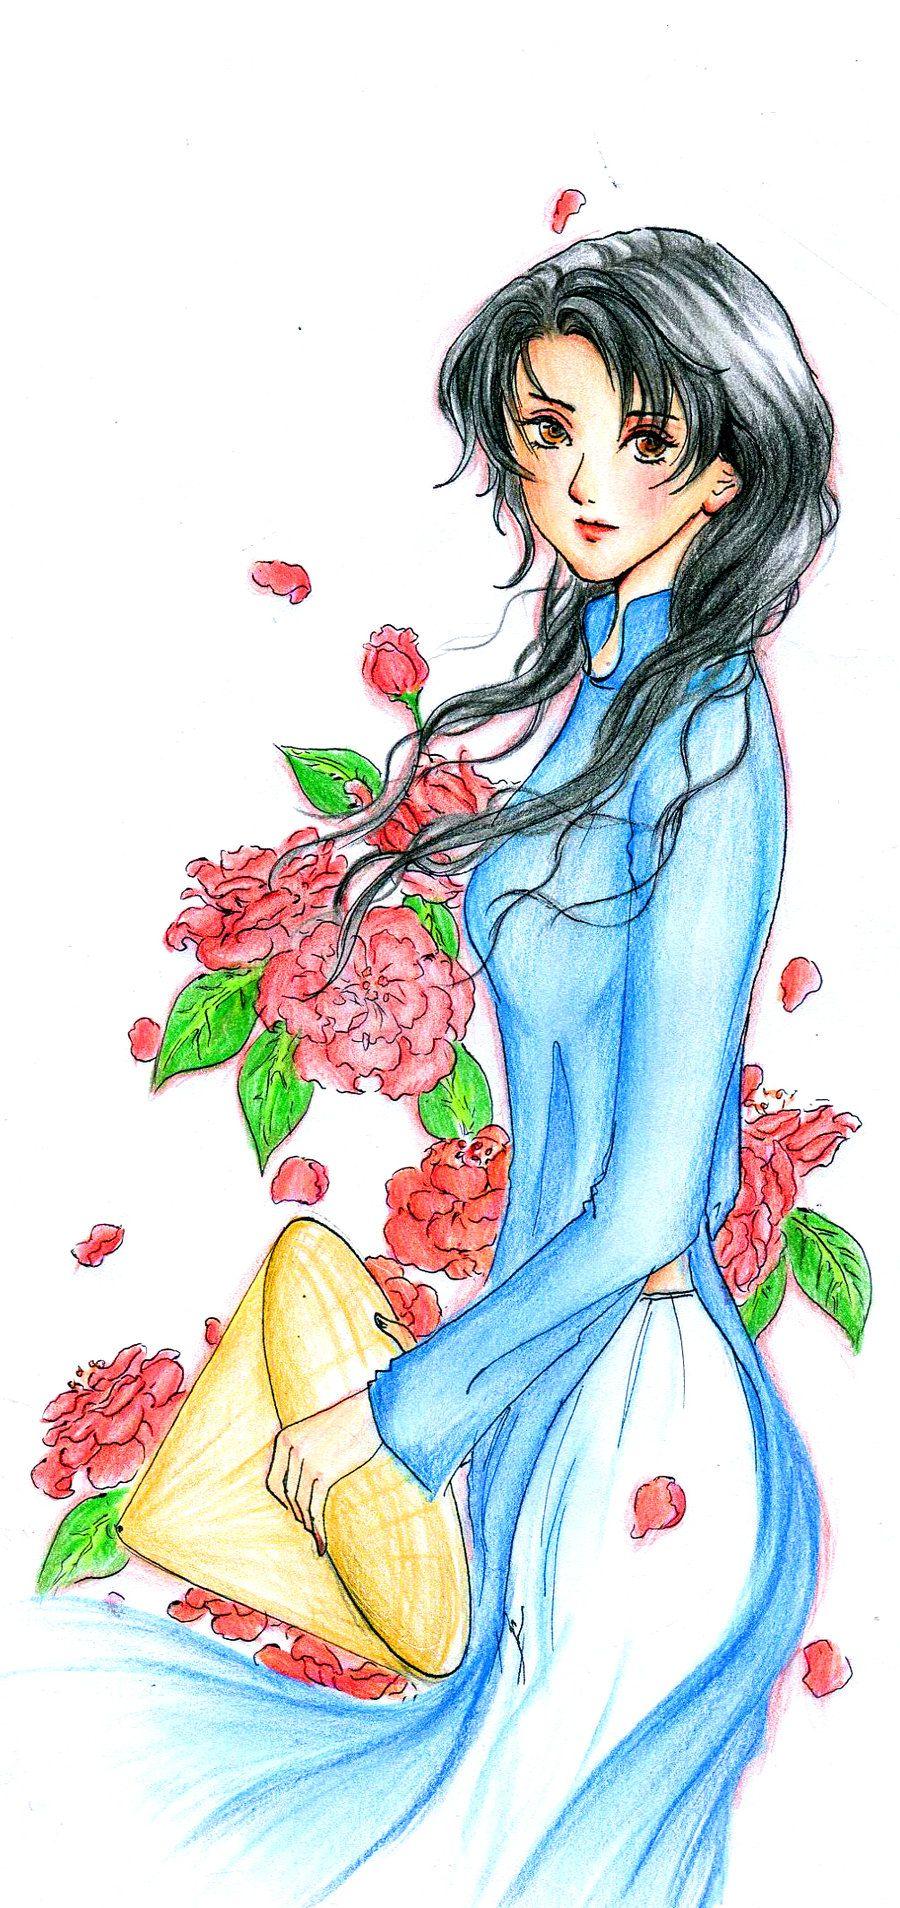 ao dai   Anime drawings, Pattern sketch, Drawings